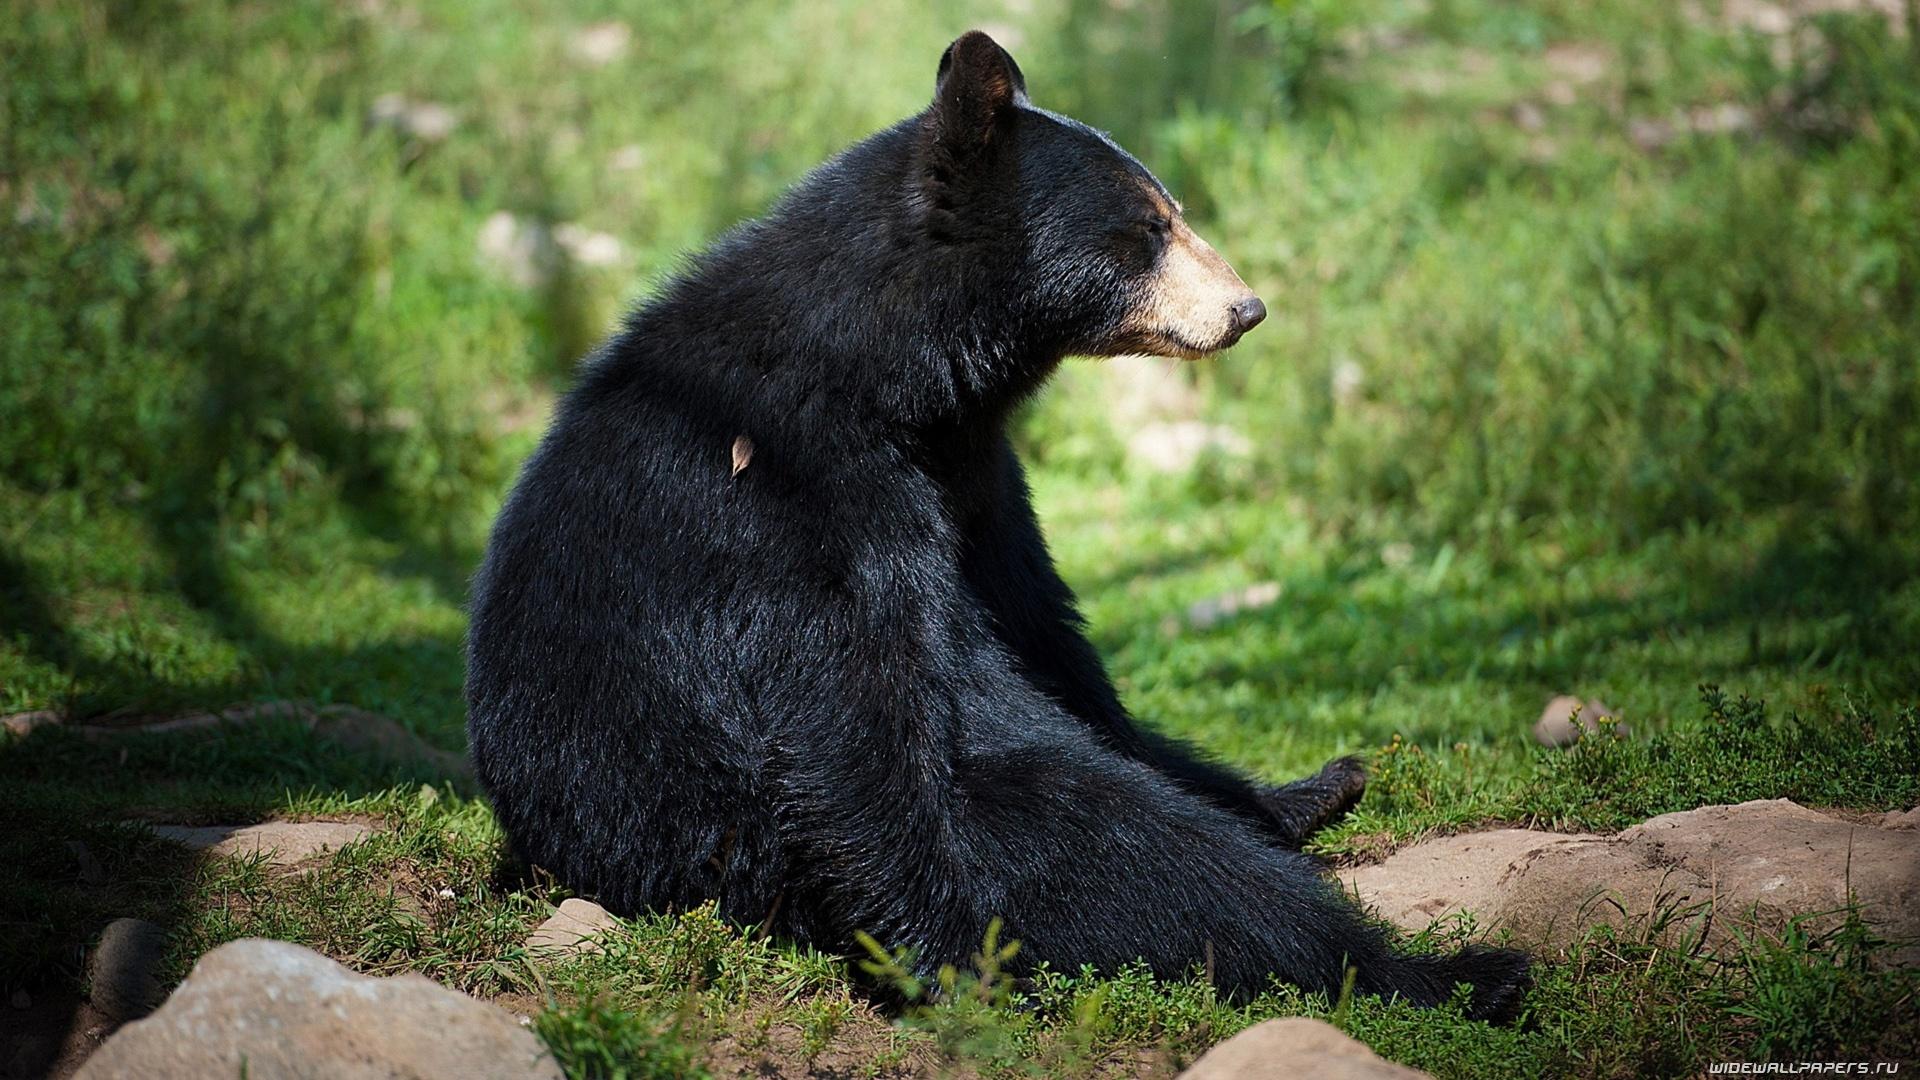 Black Bear Wallpaper image hd